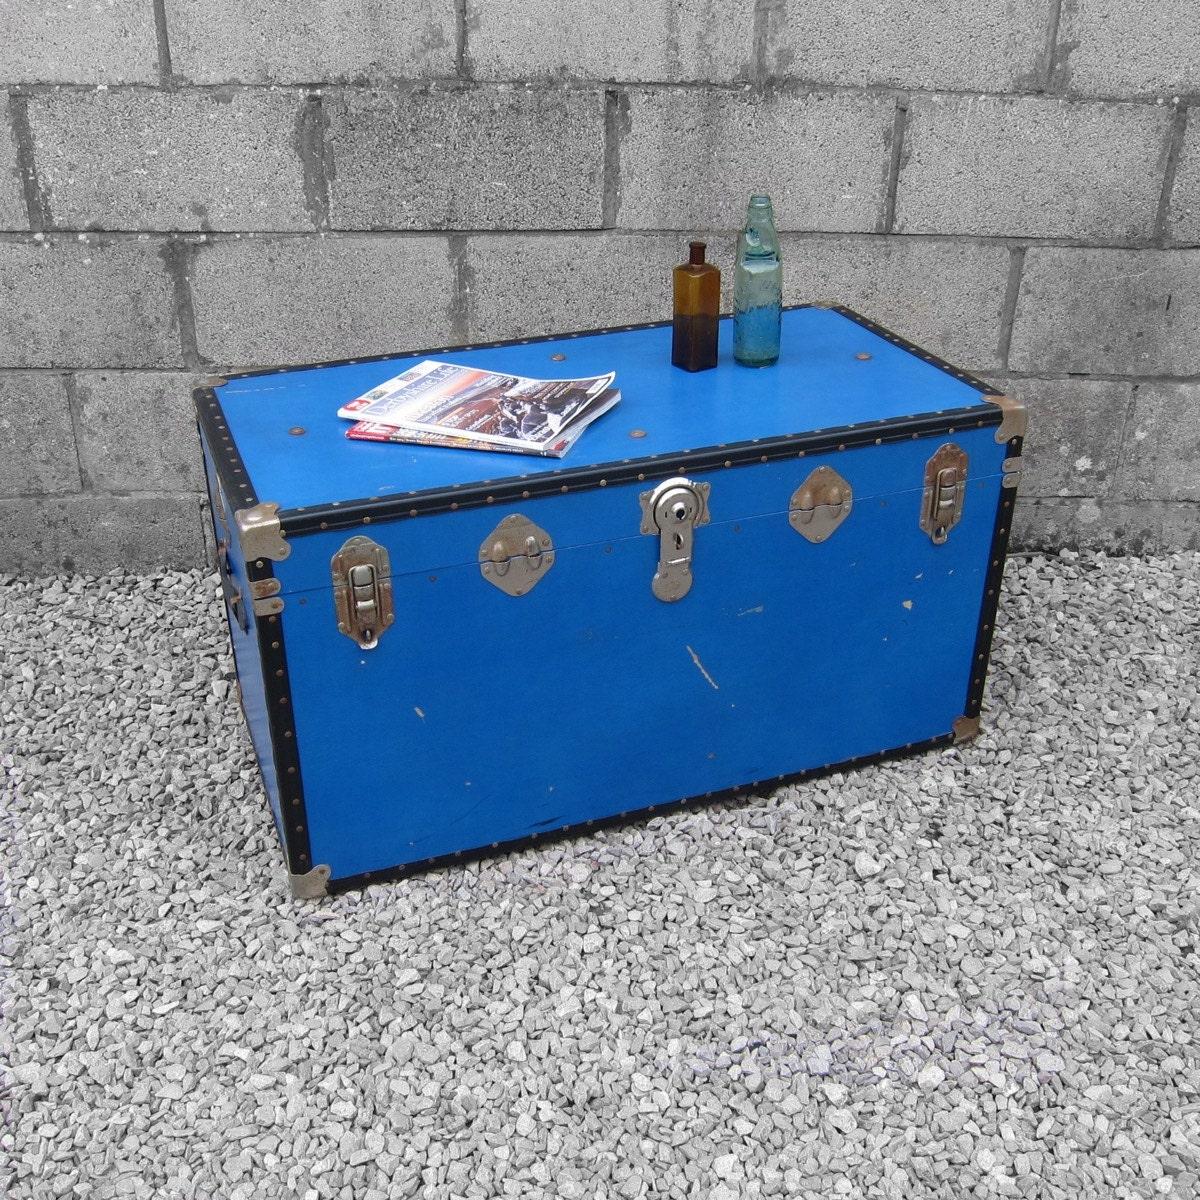 Vintage 1950s Vibrant Blue Storage Chest Travel Trunk Coffee Table Box Haute Juice